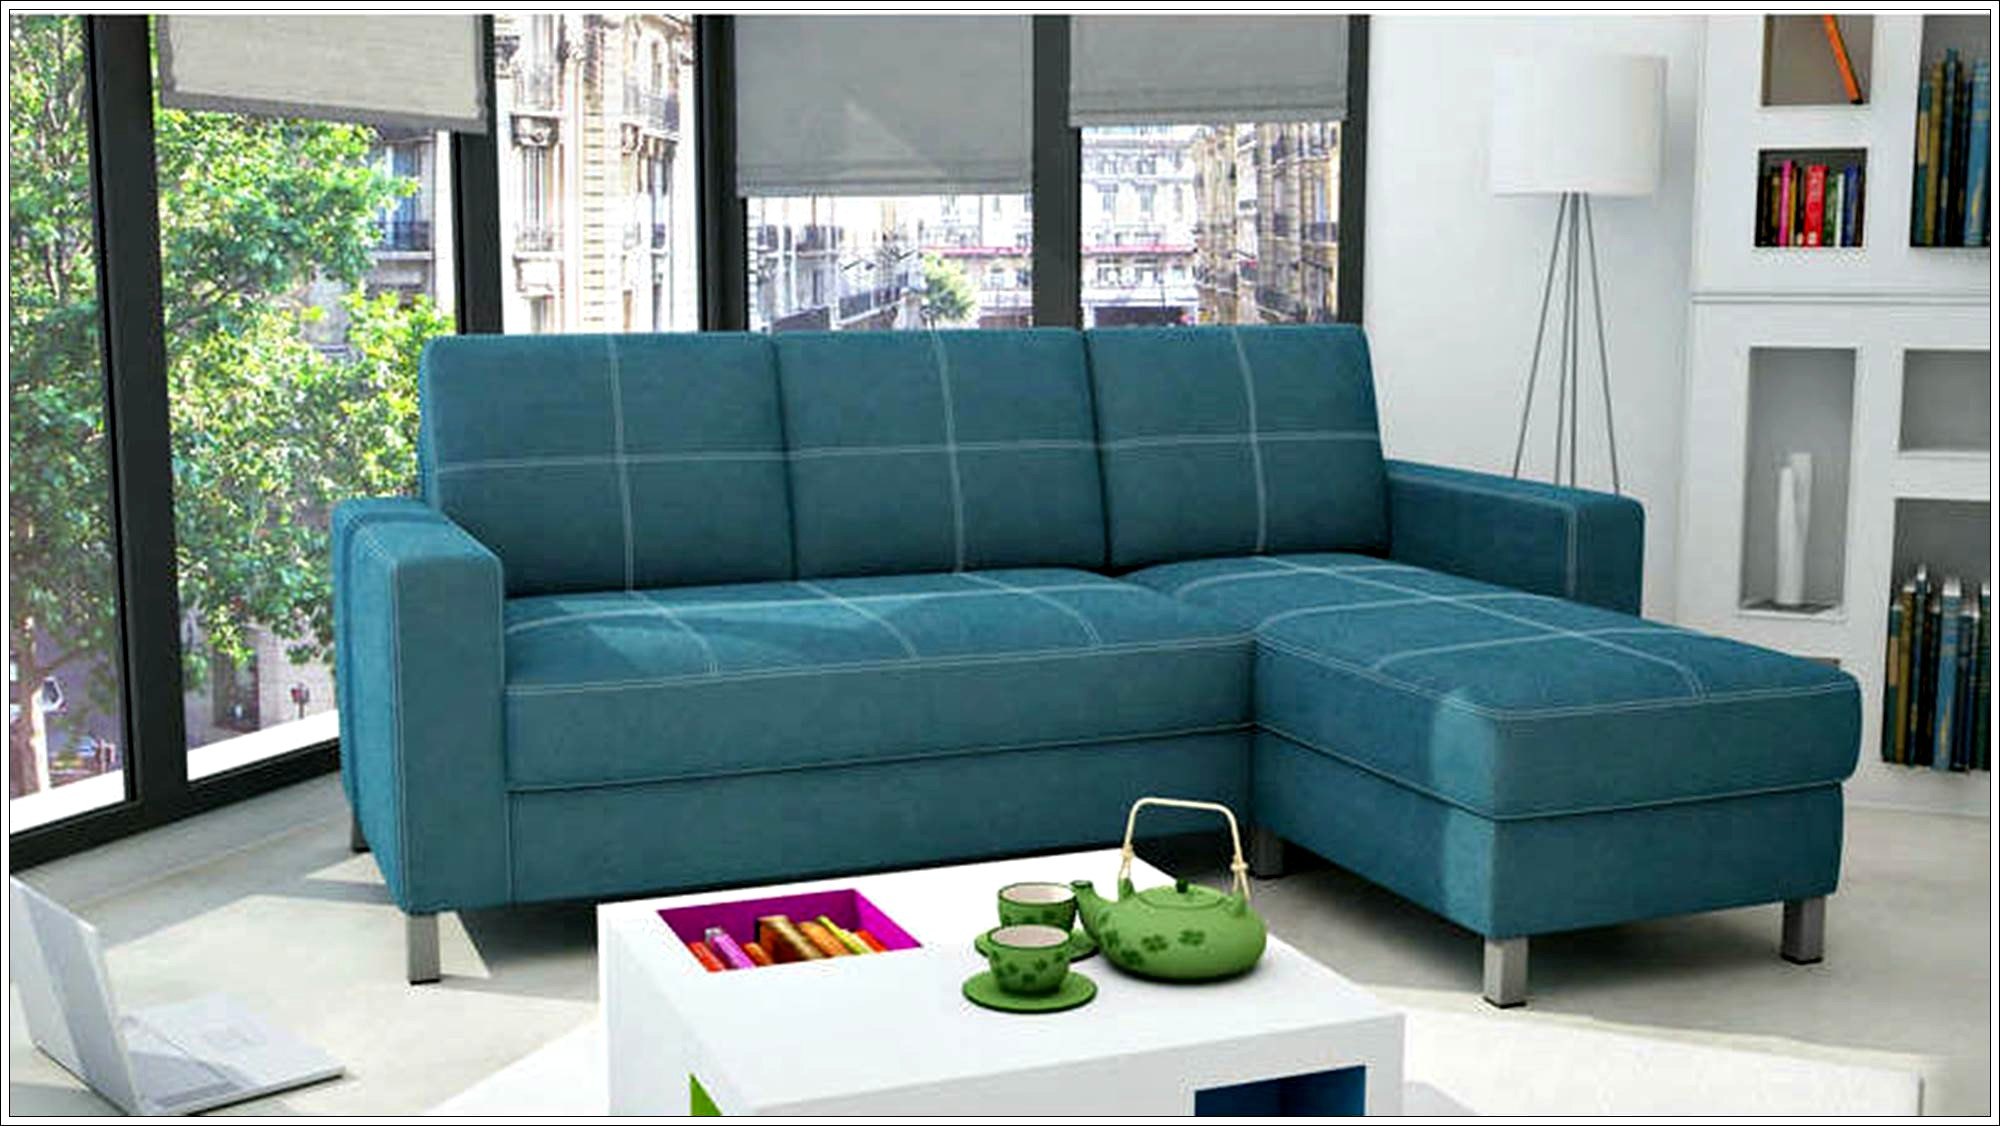 Canapé D Angle Ikea Convertible Inspirant Stock Divan Pas Cher 30 S Canape 2 Places Convertible De Canapes